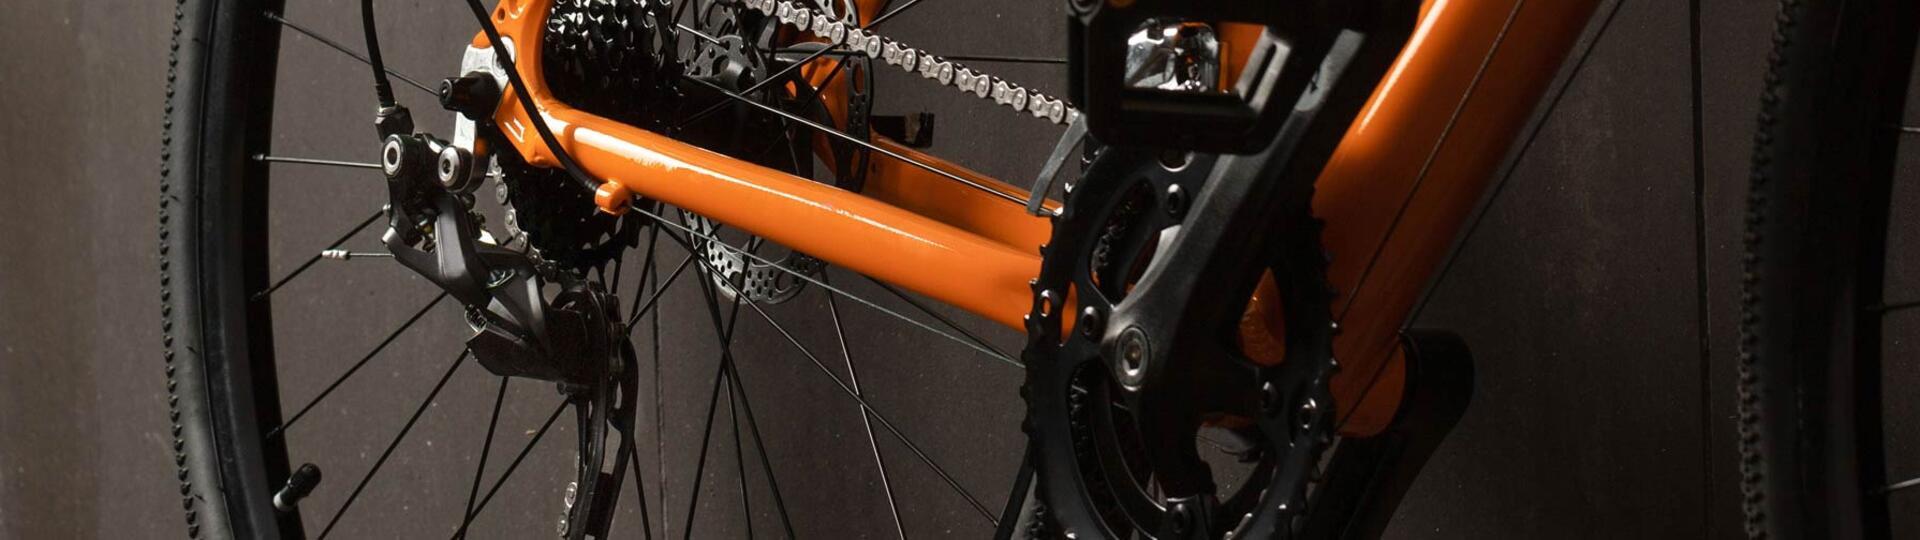 cycling.oxygenhotel it percorsi-gravel-bike-rimini 012